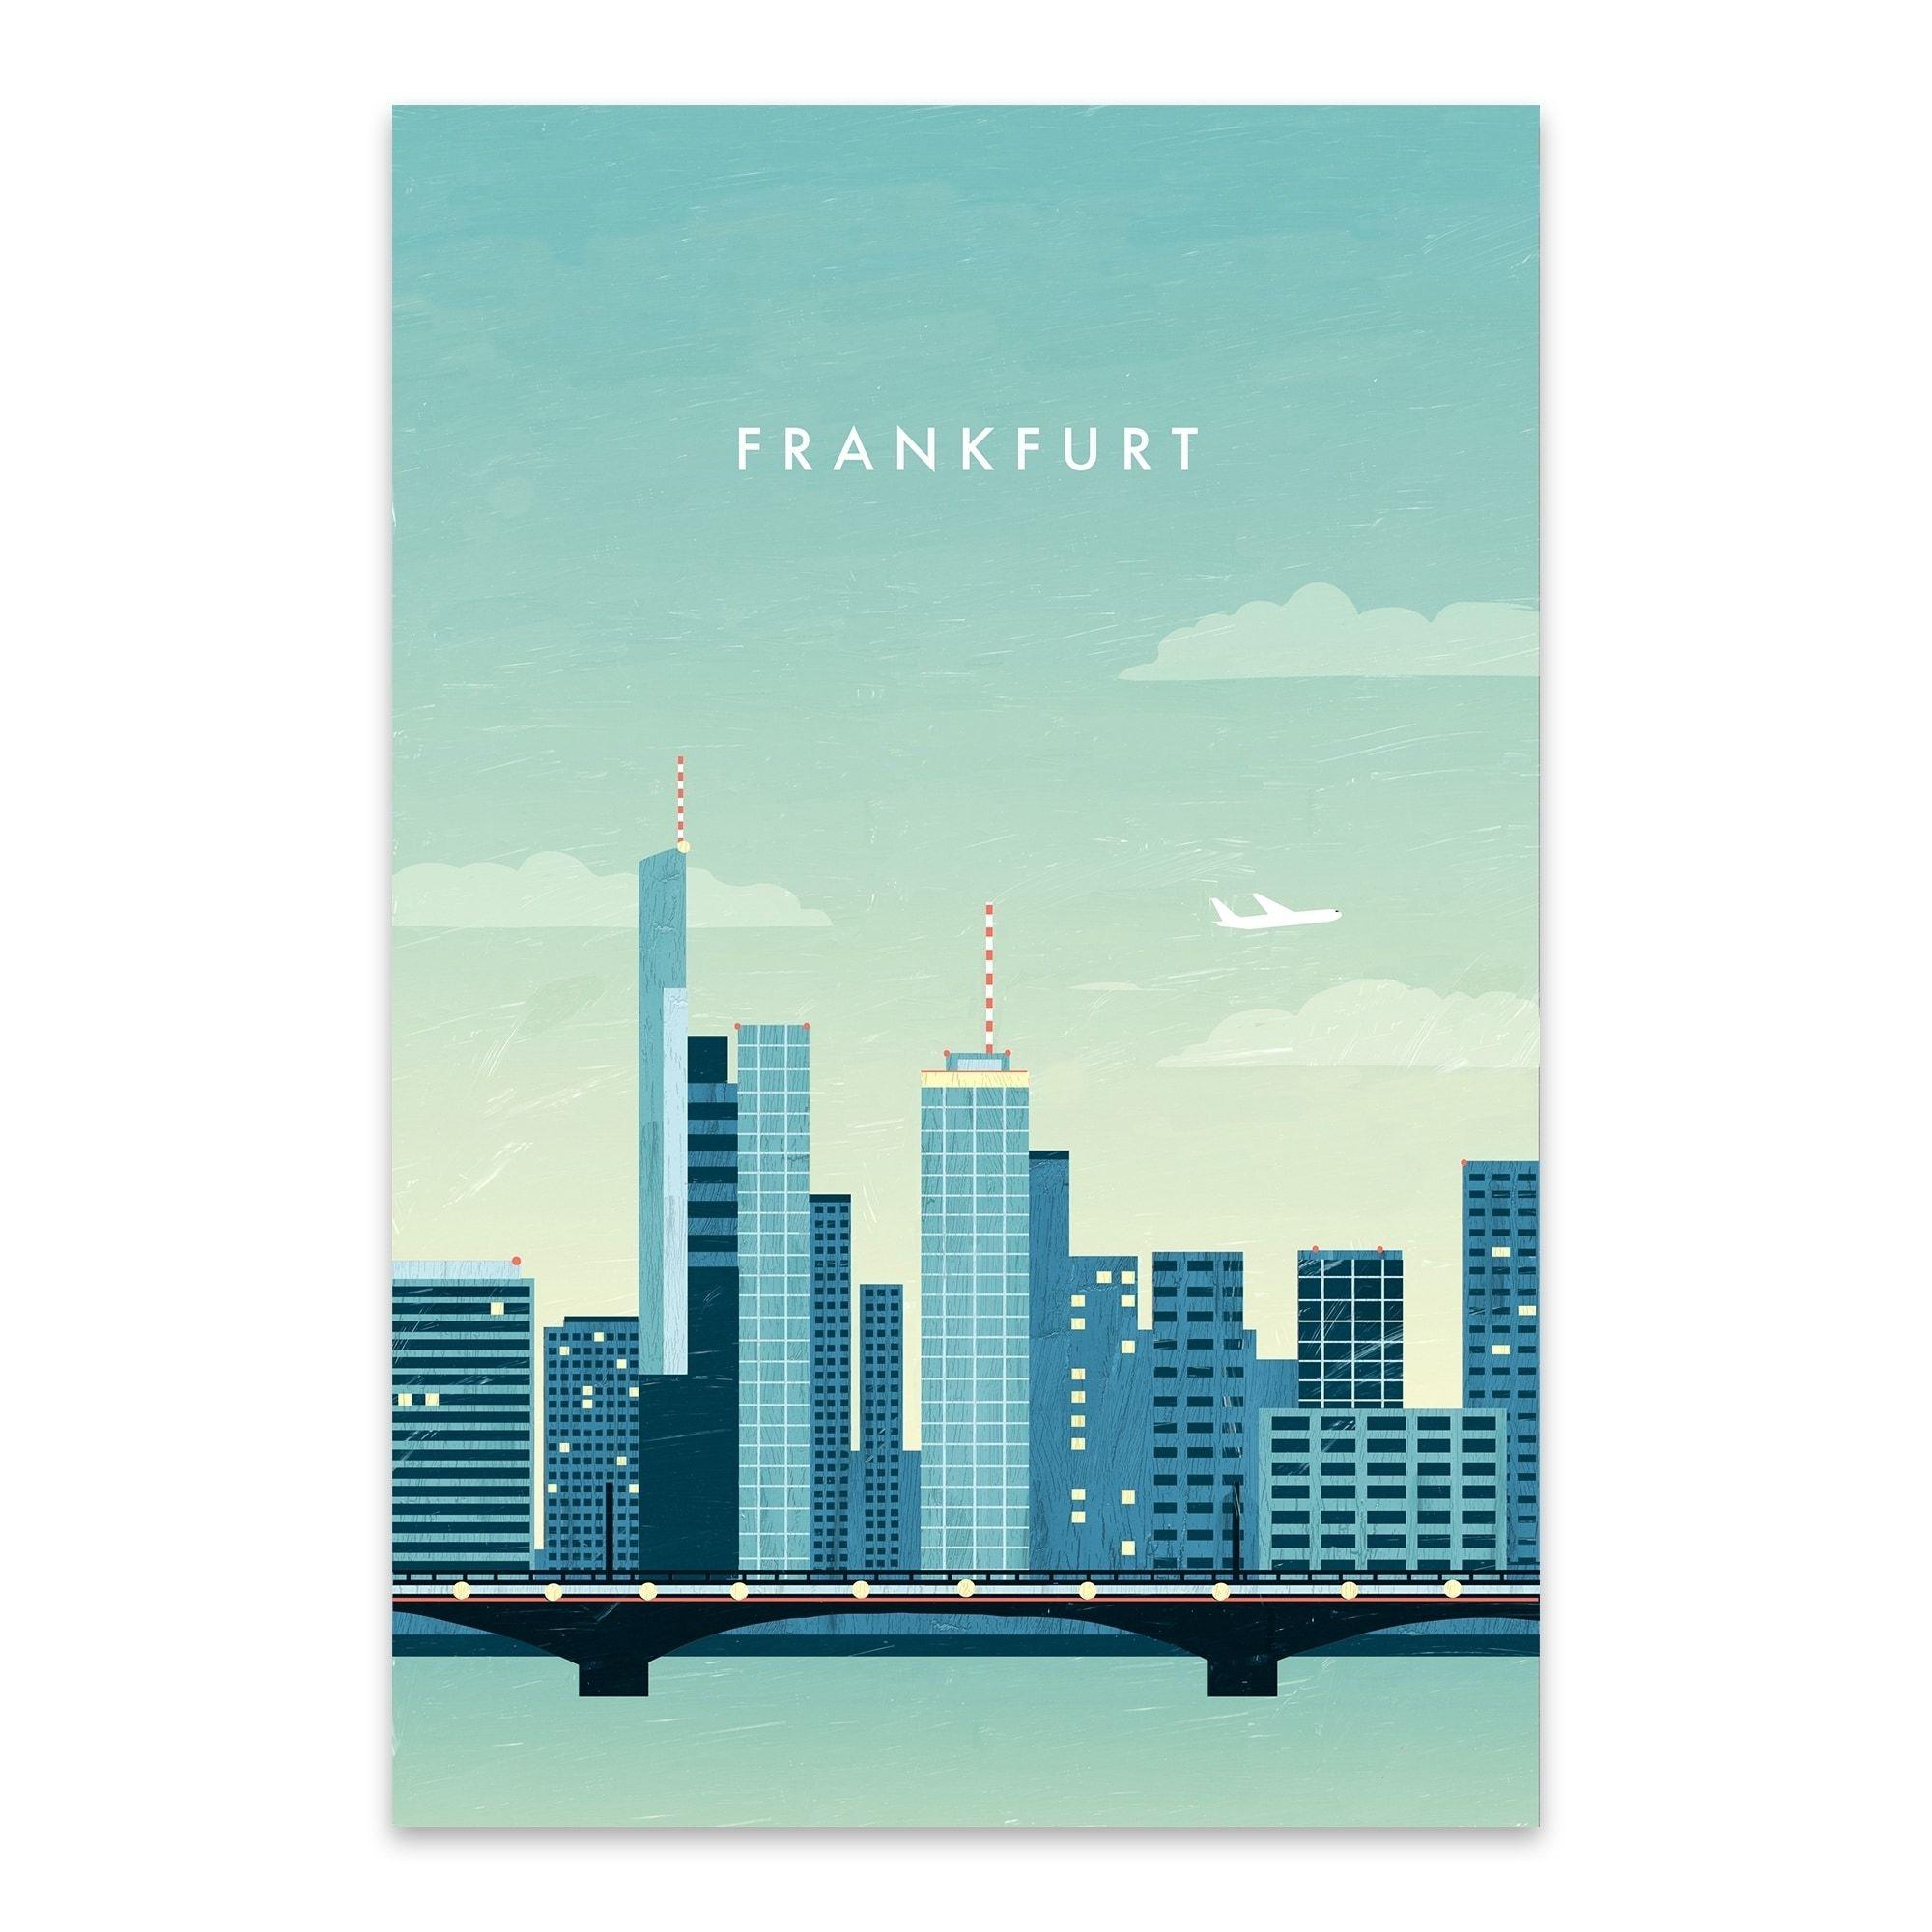 Сентября, открытки и плакаты екатеринбург